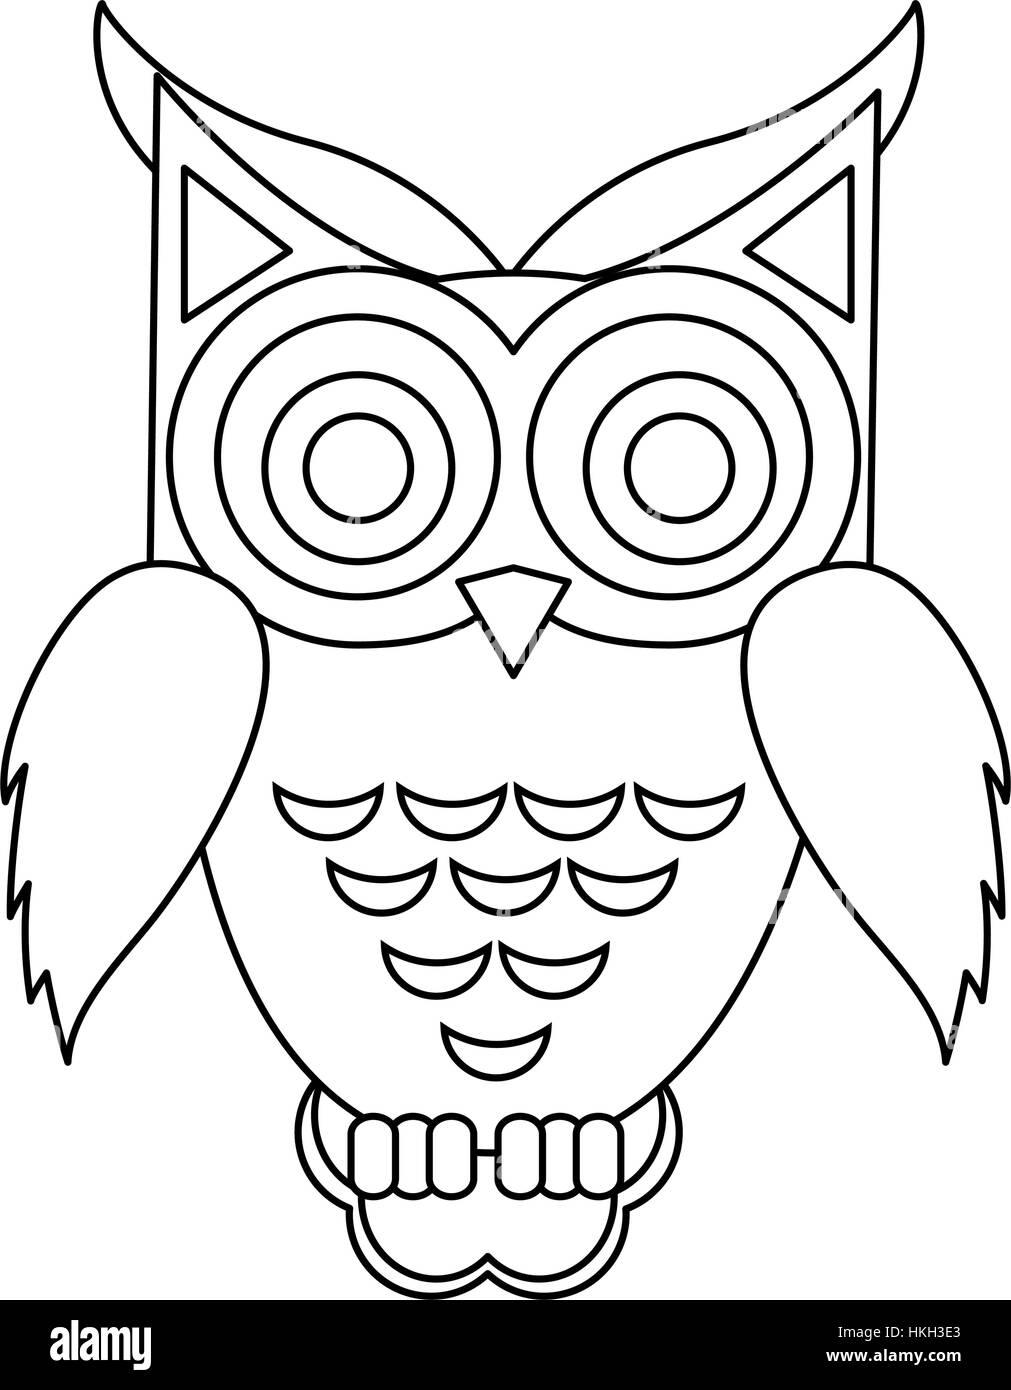 Owl Cartoon Black And White Stock Photos Images Alamy